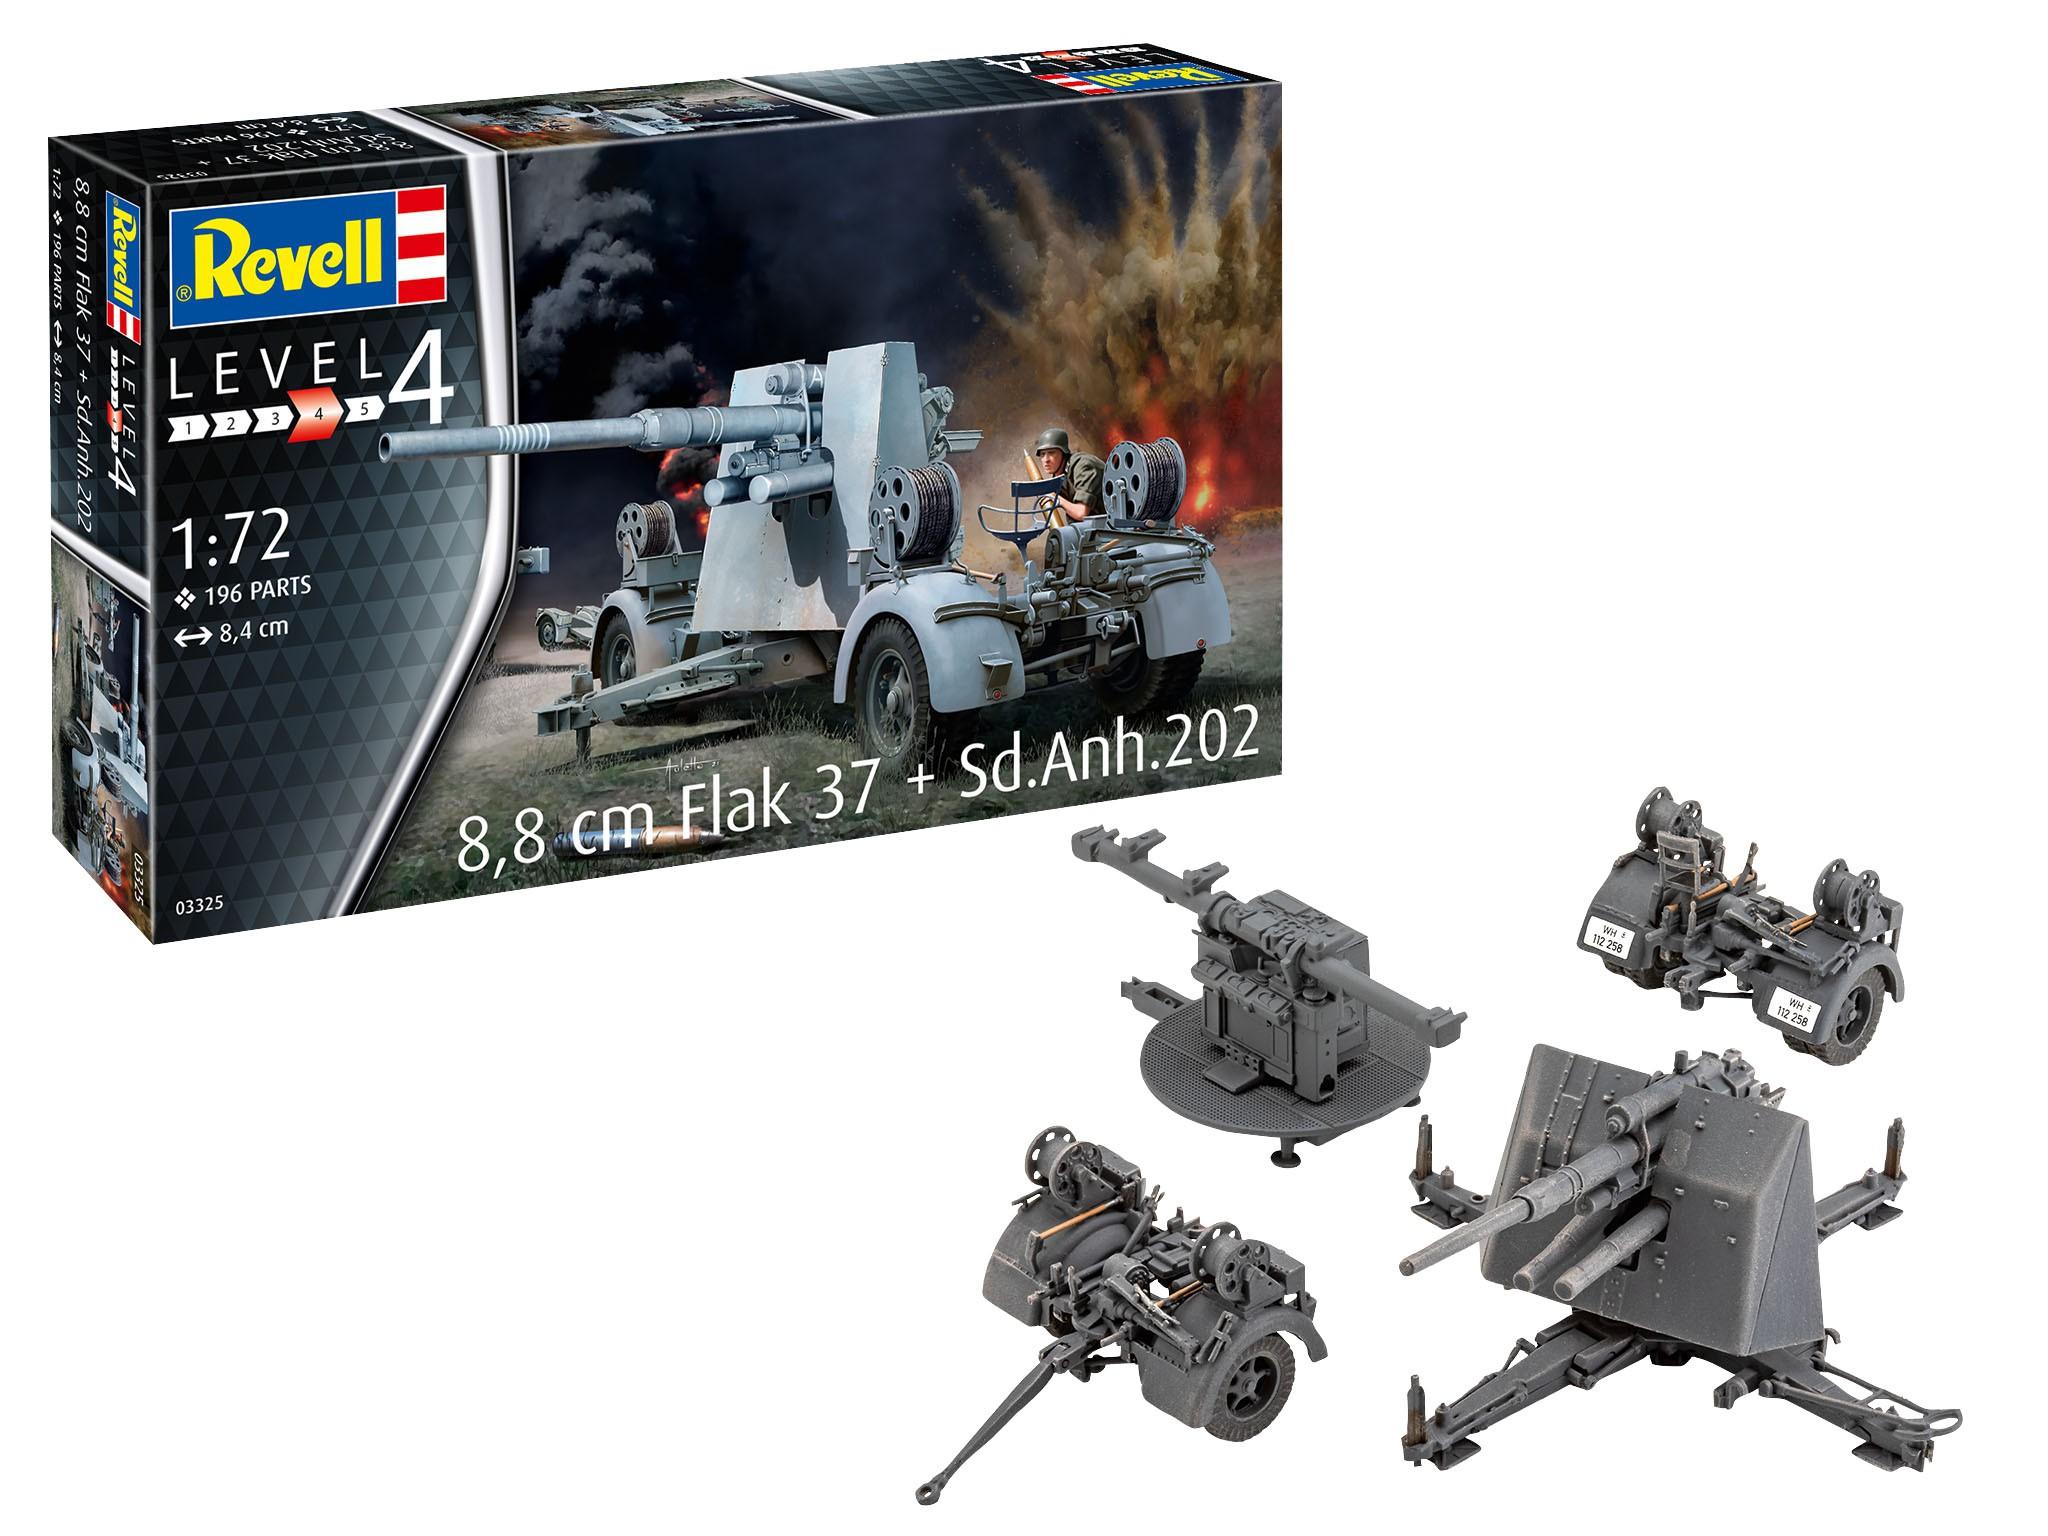 8,8cm Flak 37 + Sd.Anh.202